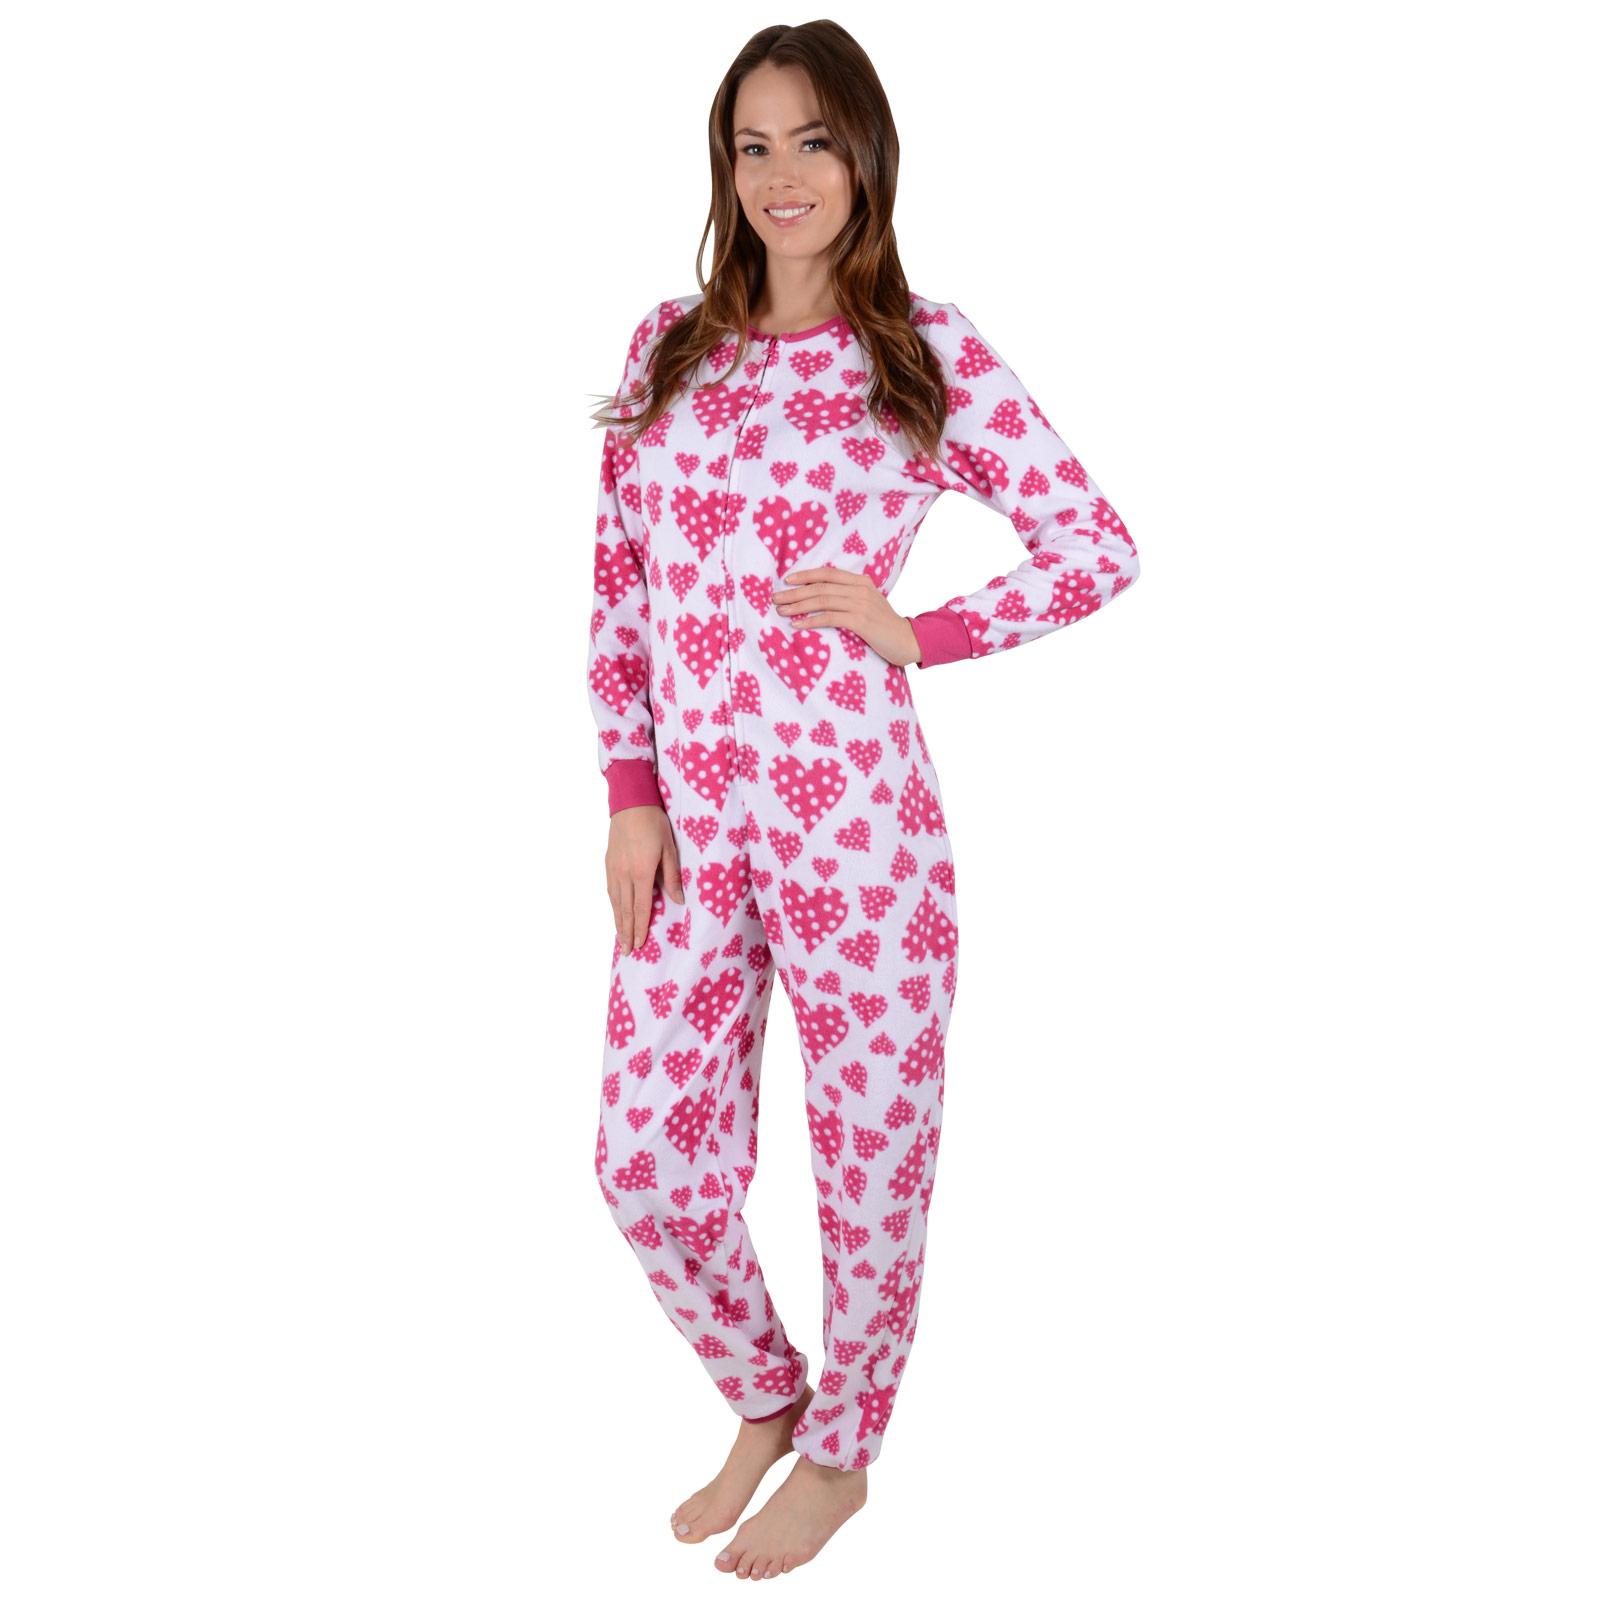 ladies fleece all in one piece pyjamas jump sleep suit